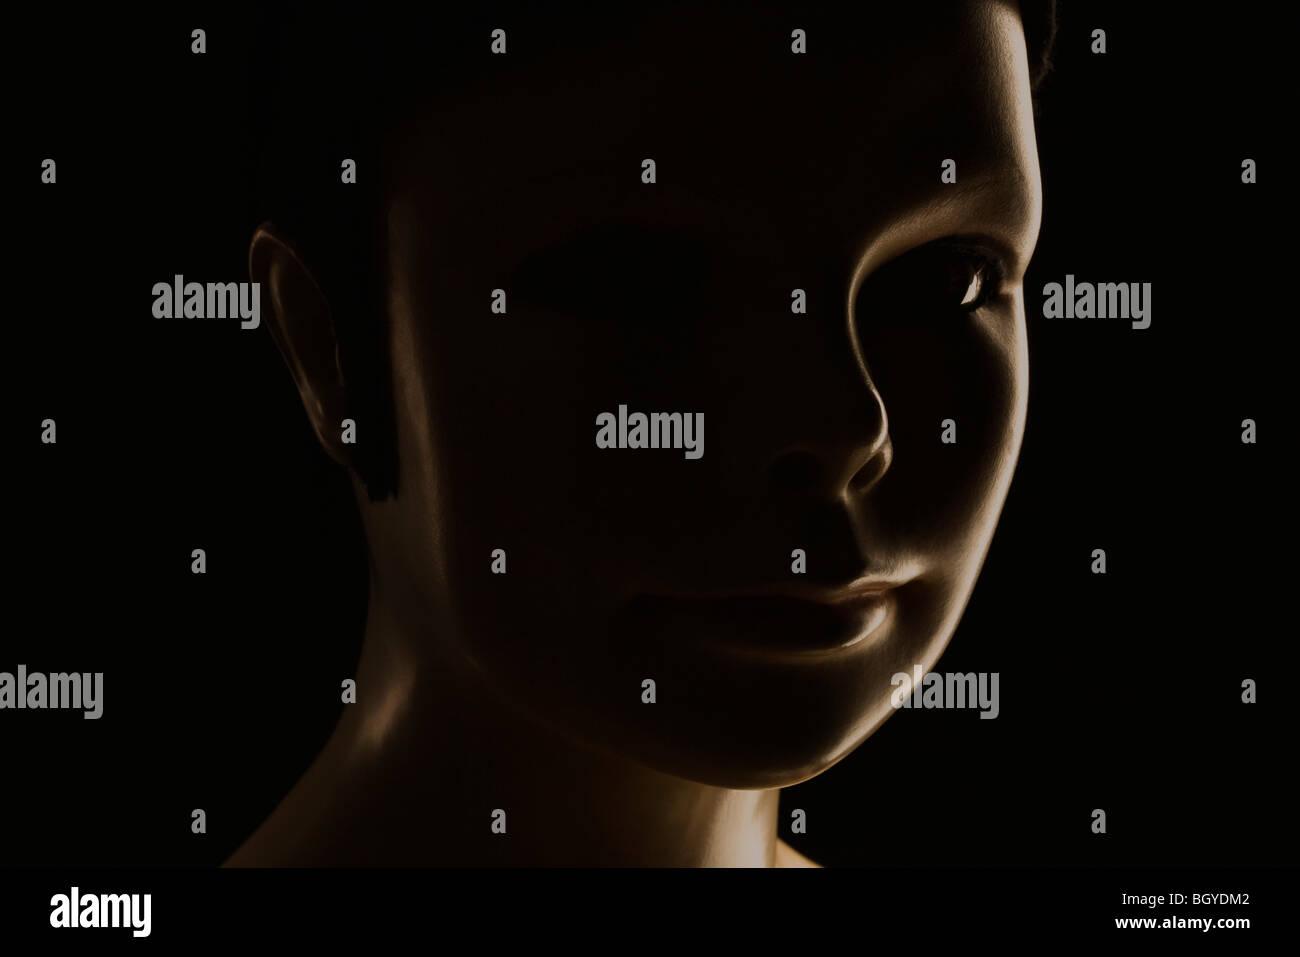 Female mannequin, portrait - Stock Image